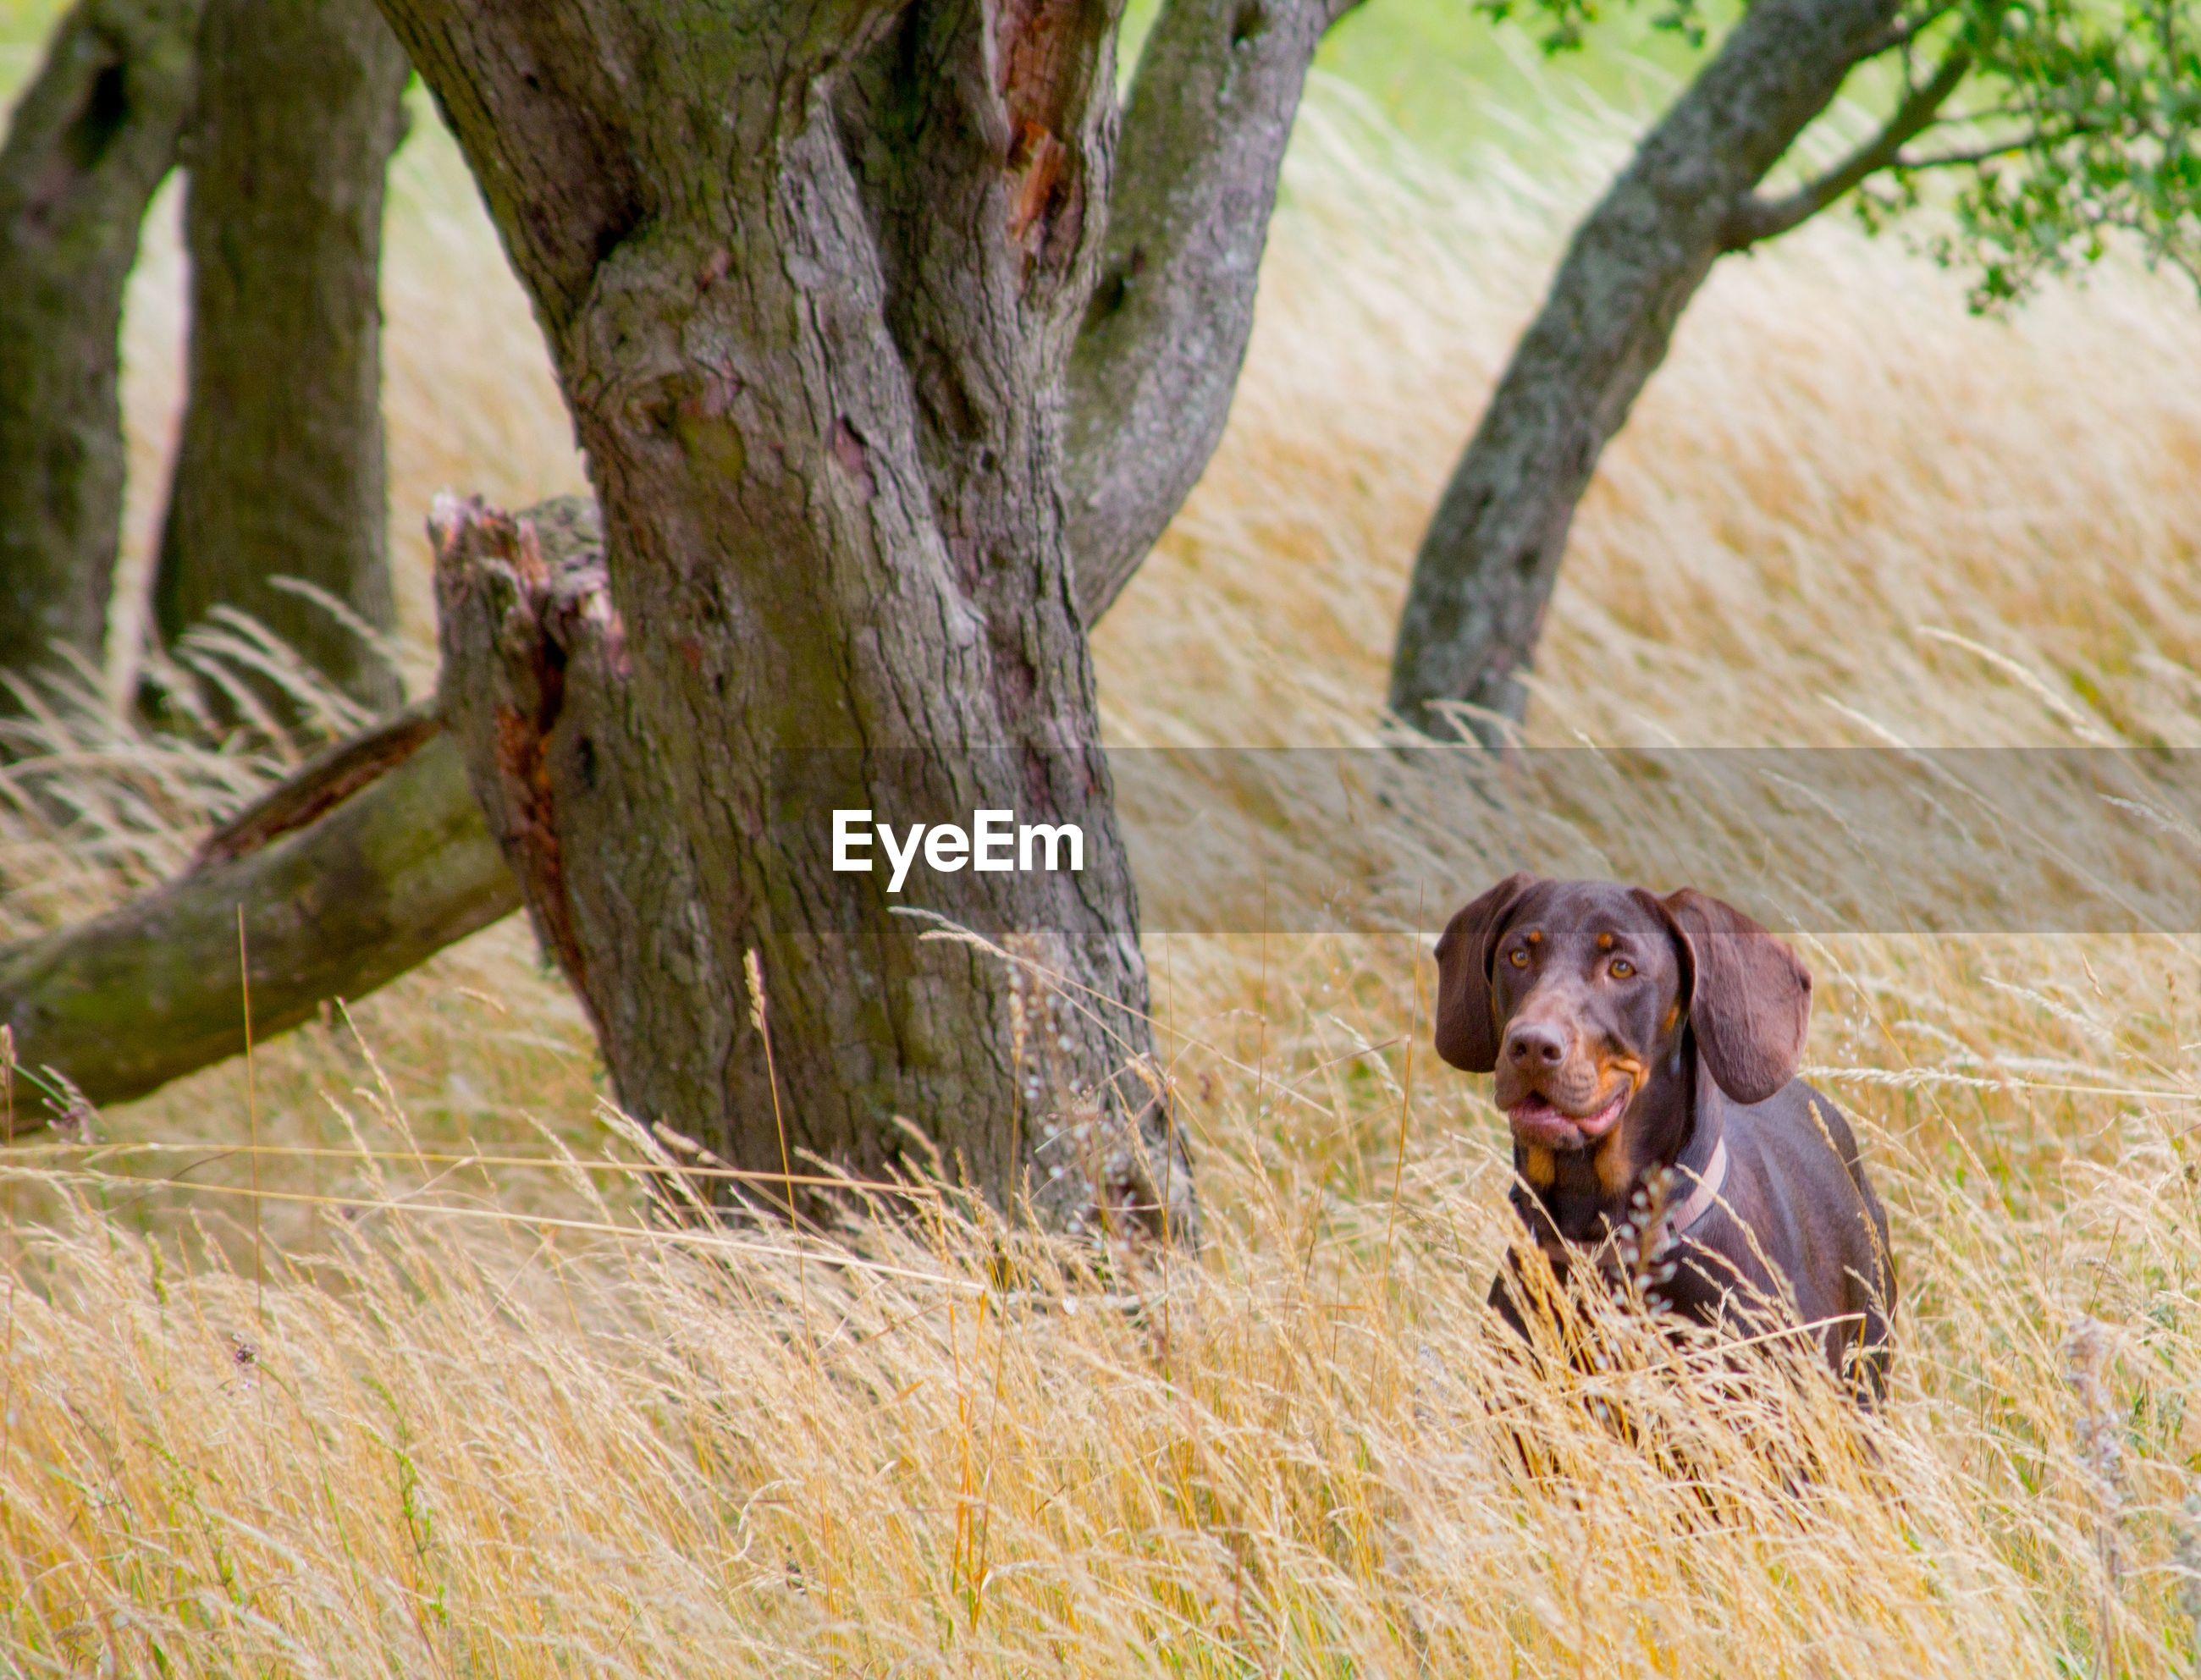 Portrait of polish hunting dog amidst plants on field